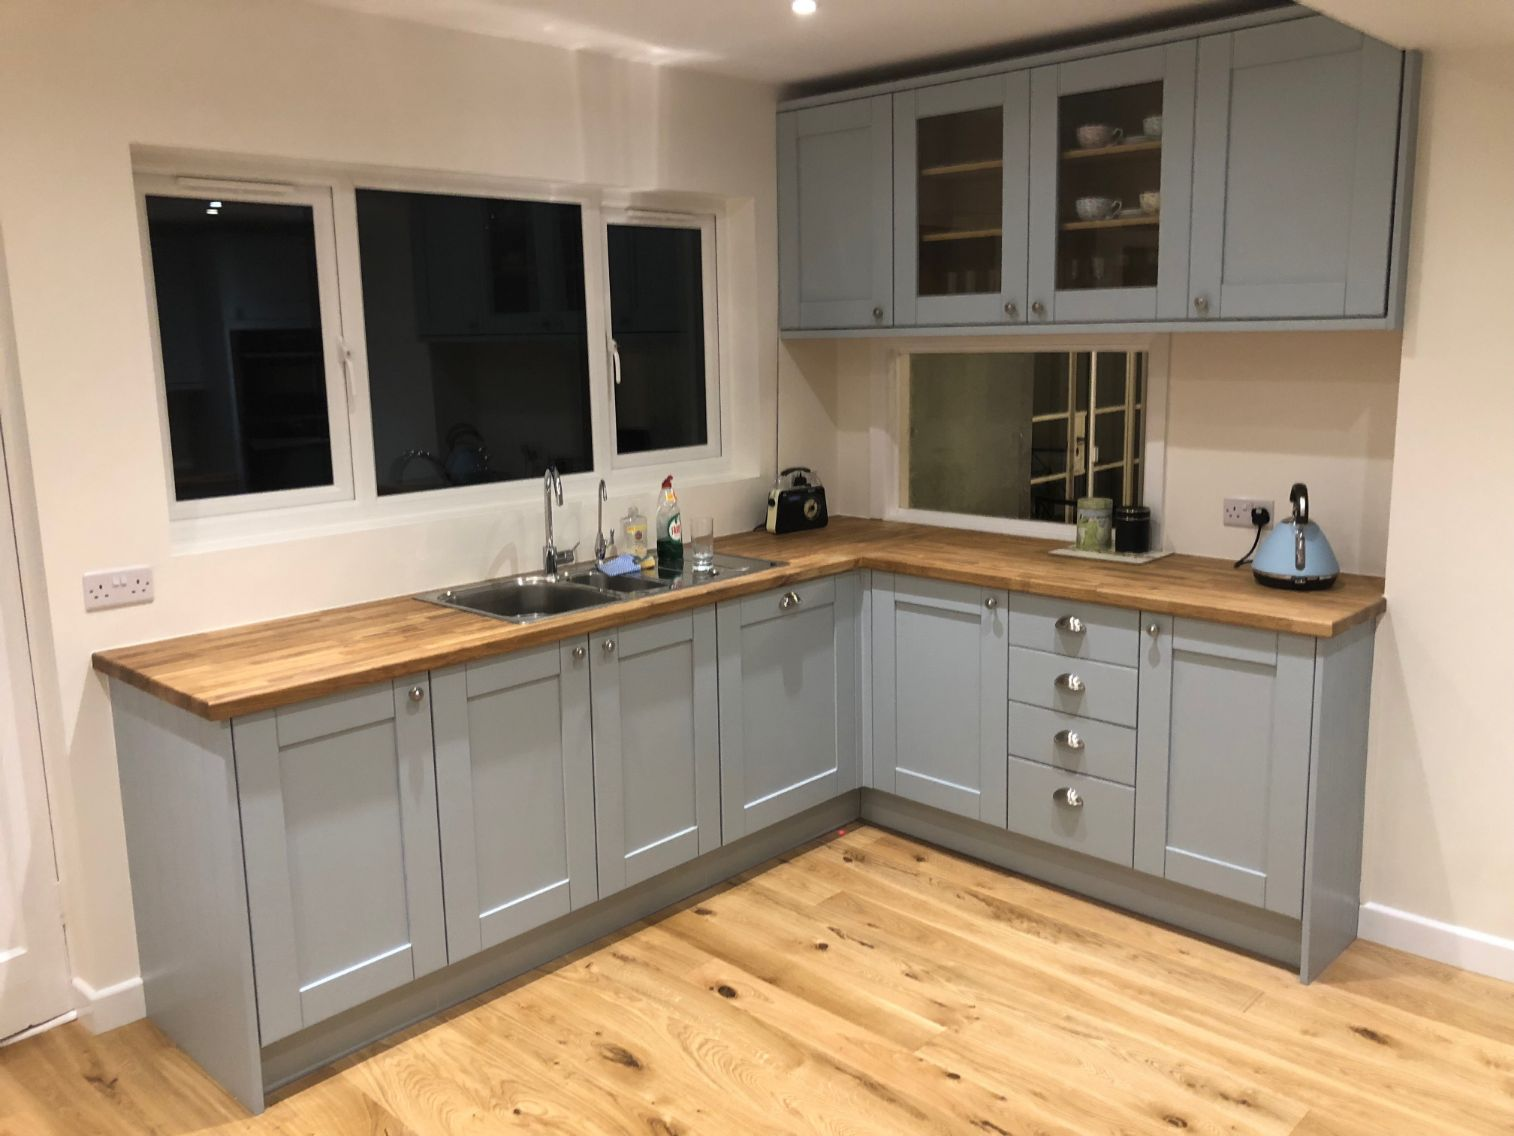 Kitchen Renovation Canford Cliffs house refurbishment